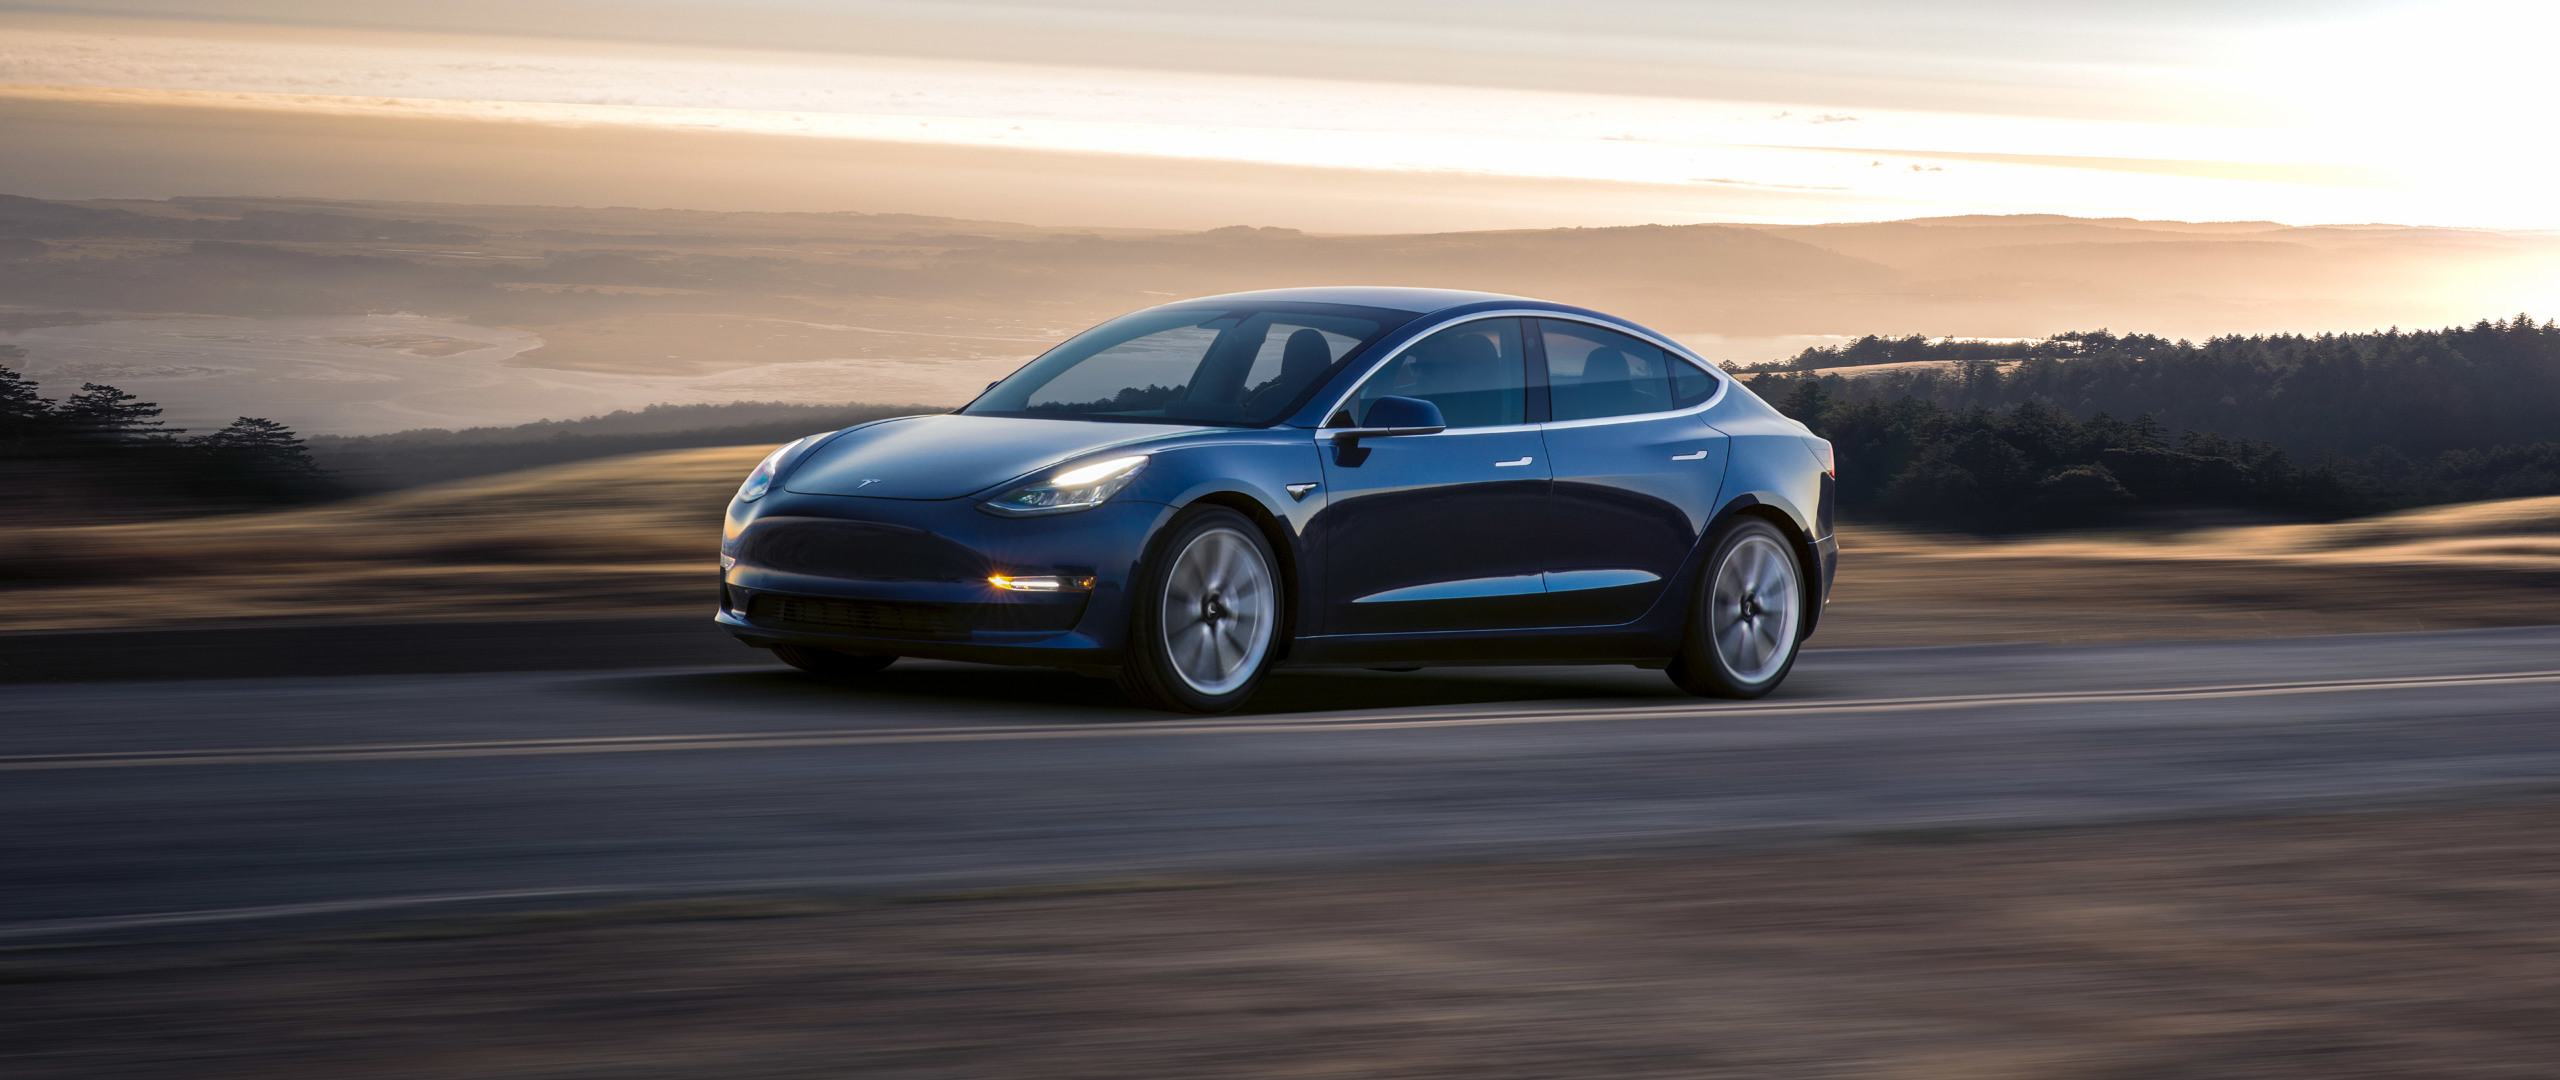 2560x1080 Tesla Model 3 2017 2560x1080 Resolution Wallpaper